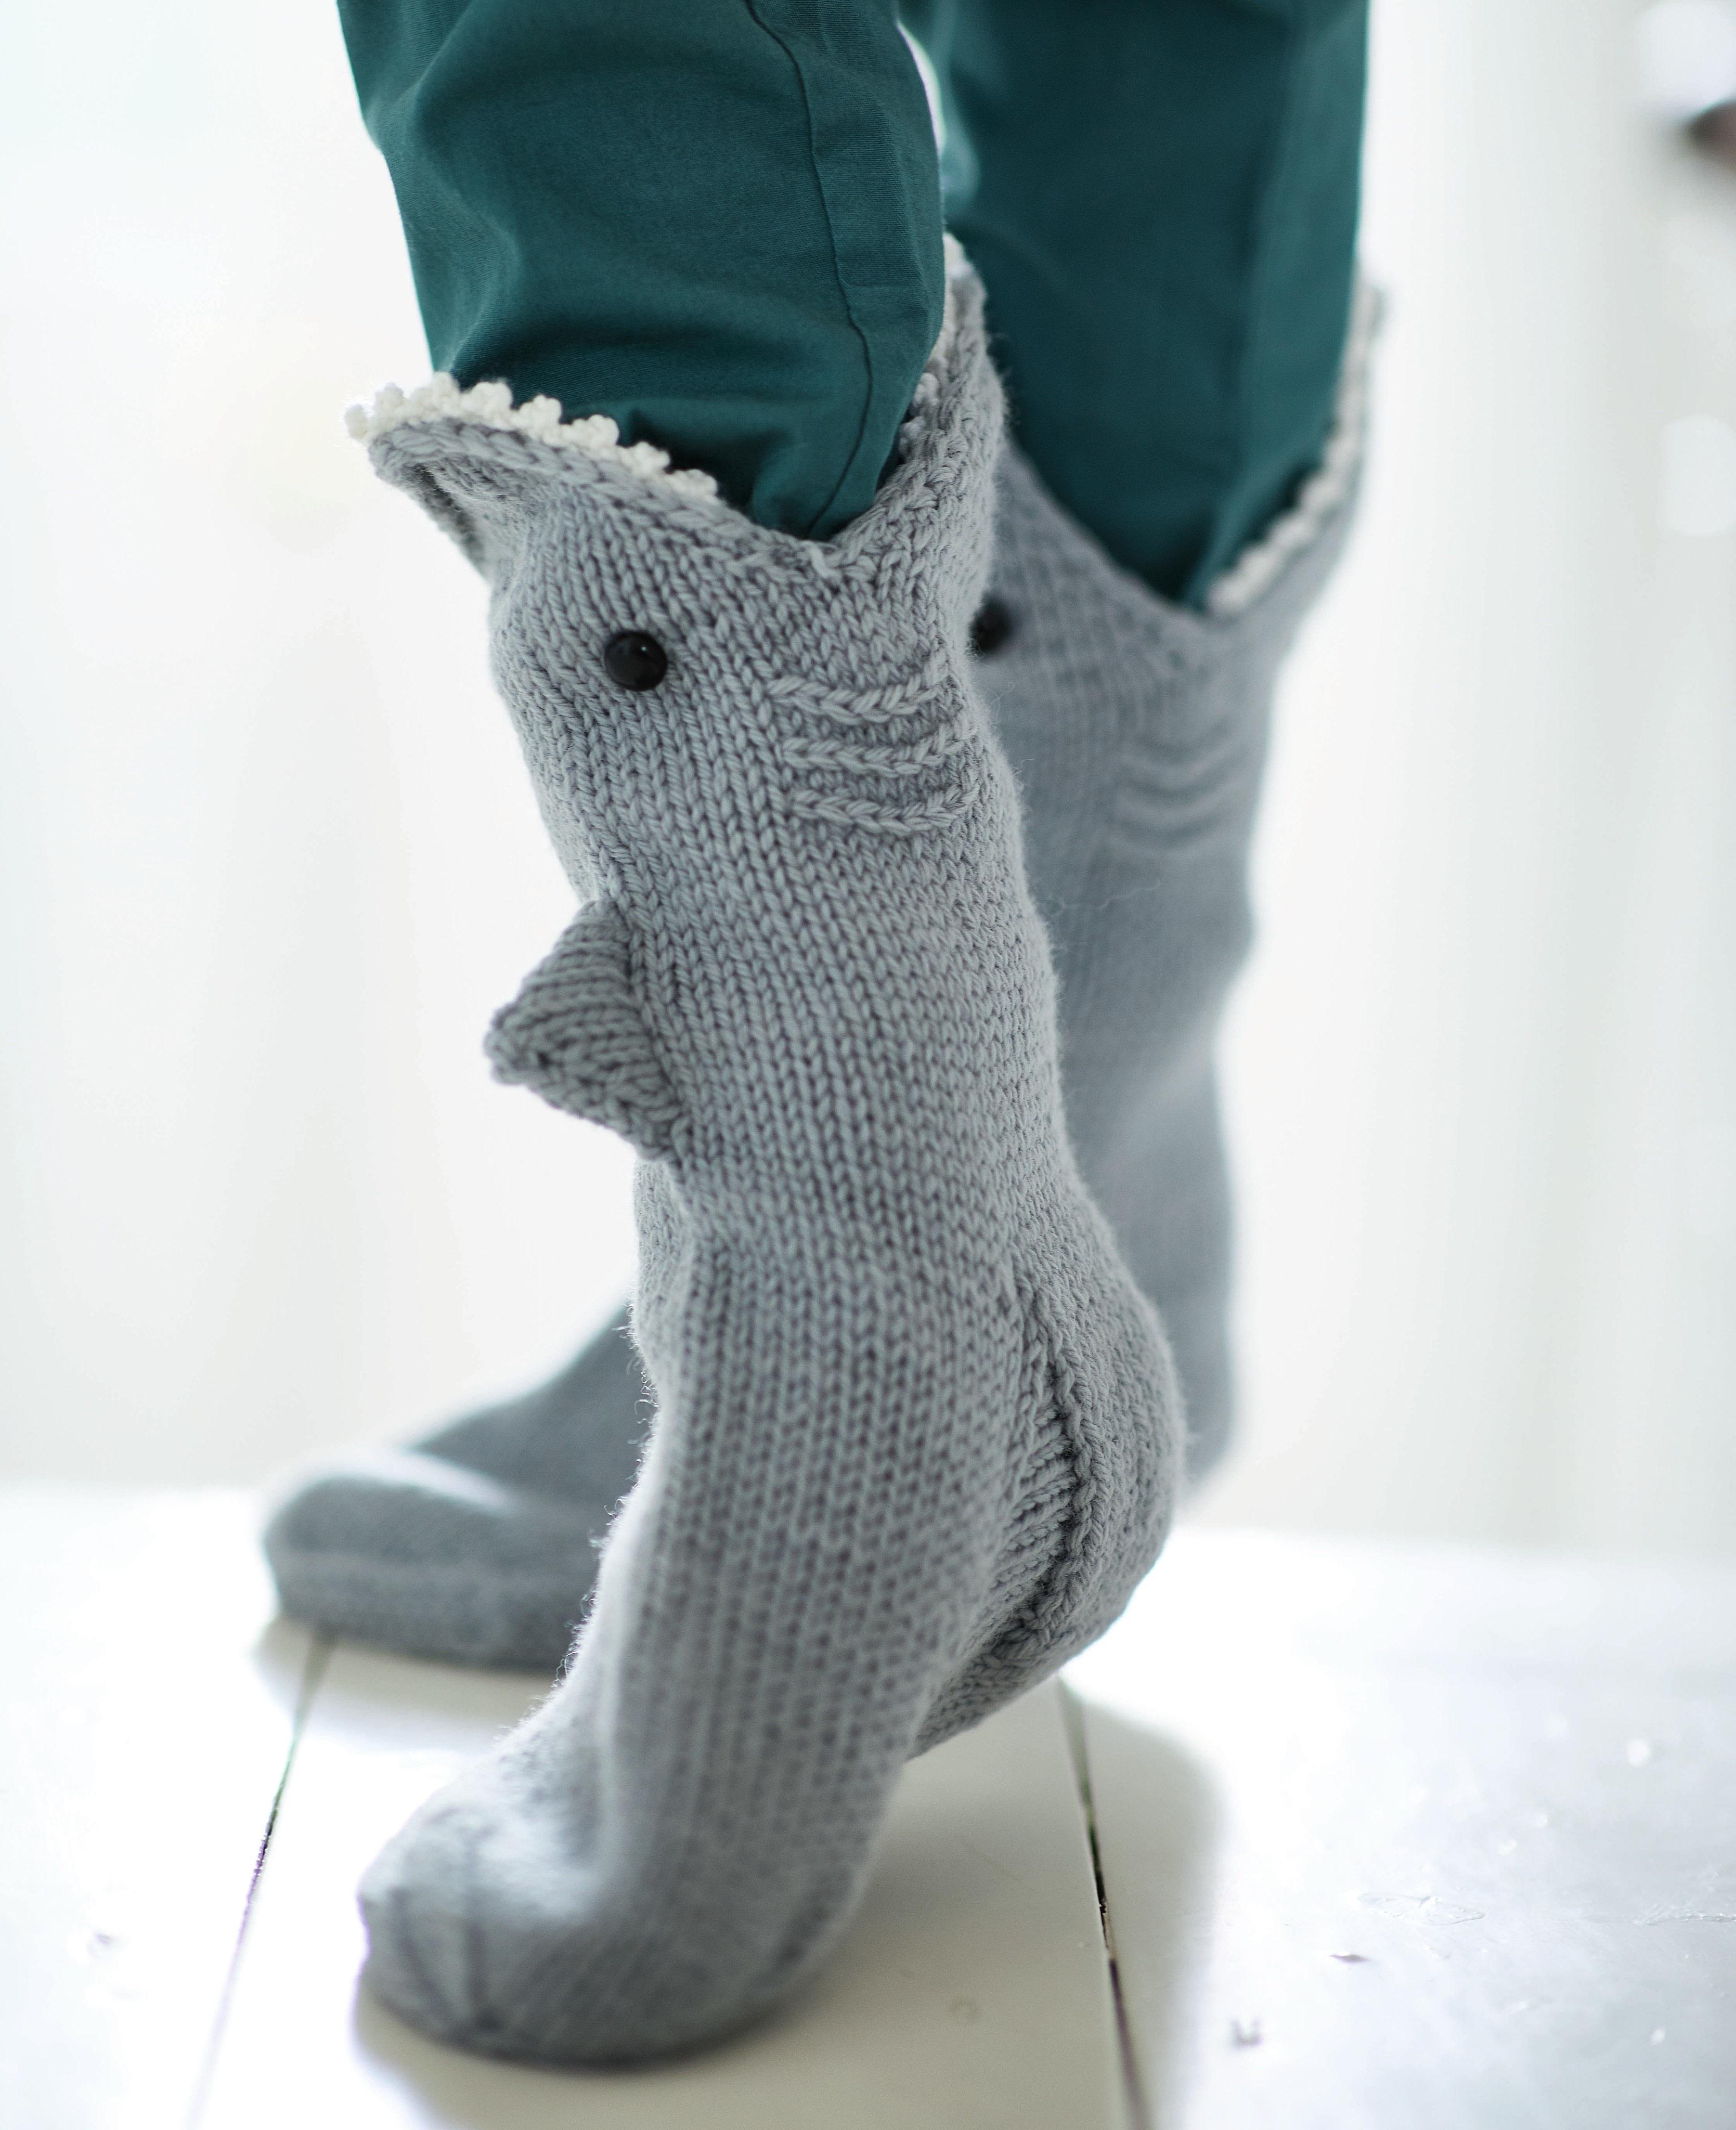 Crochet Shark Slippers Pattern Shark Socks Extract From ...